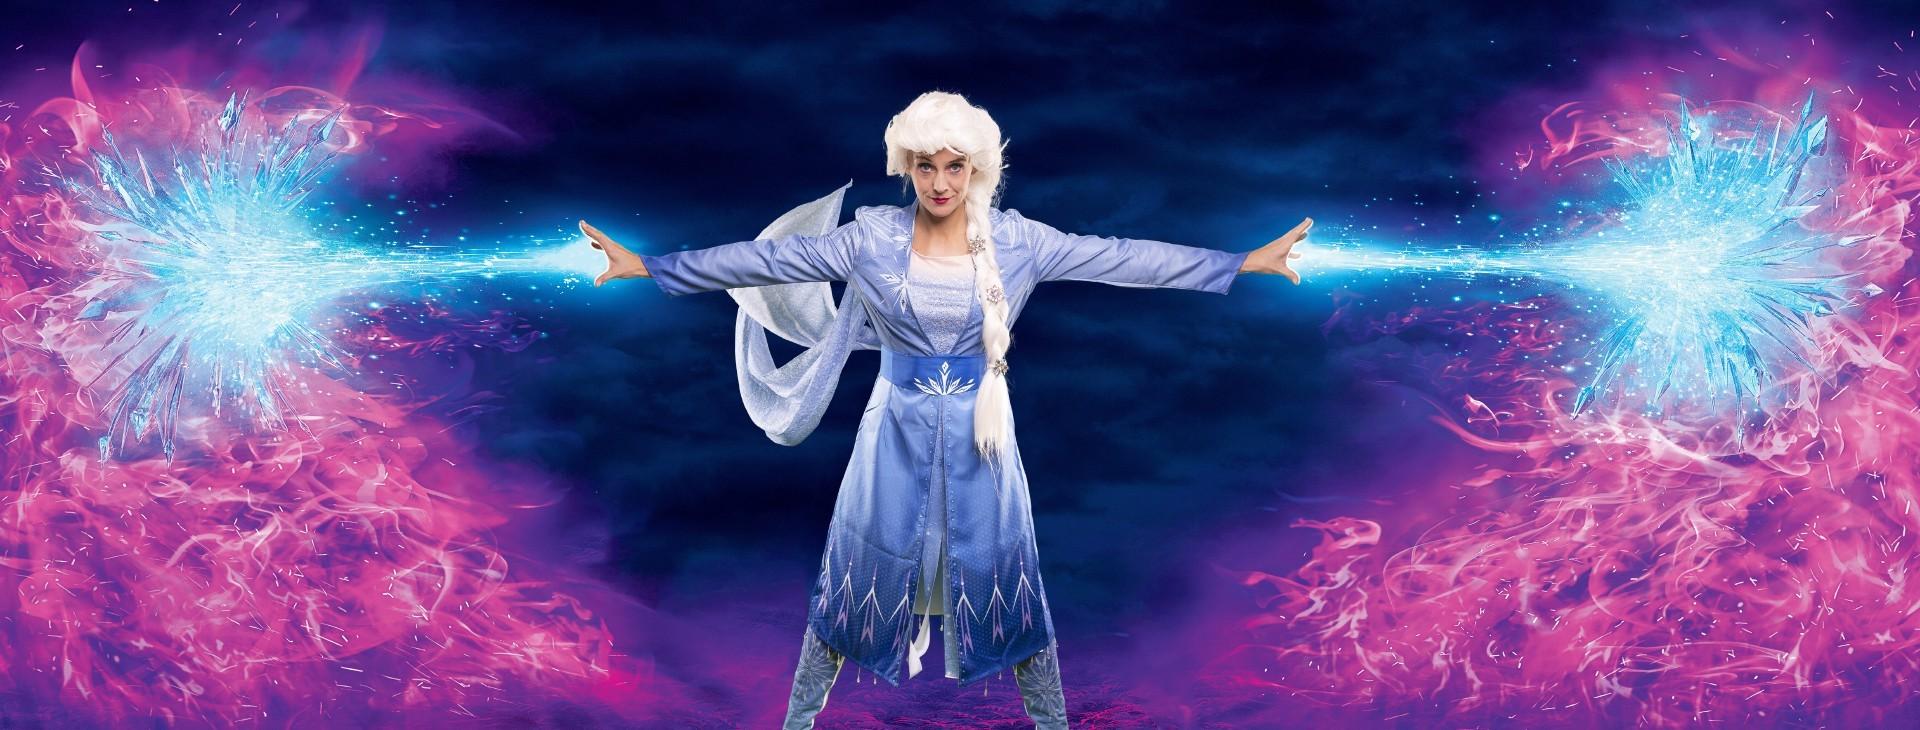 Elsa im Fotostudio 3